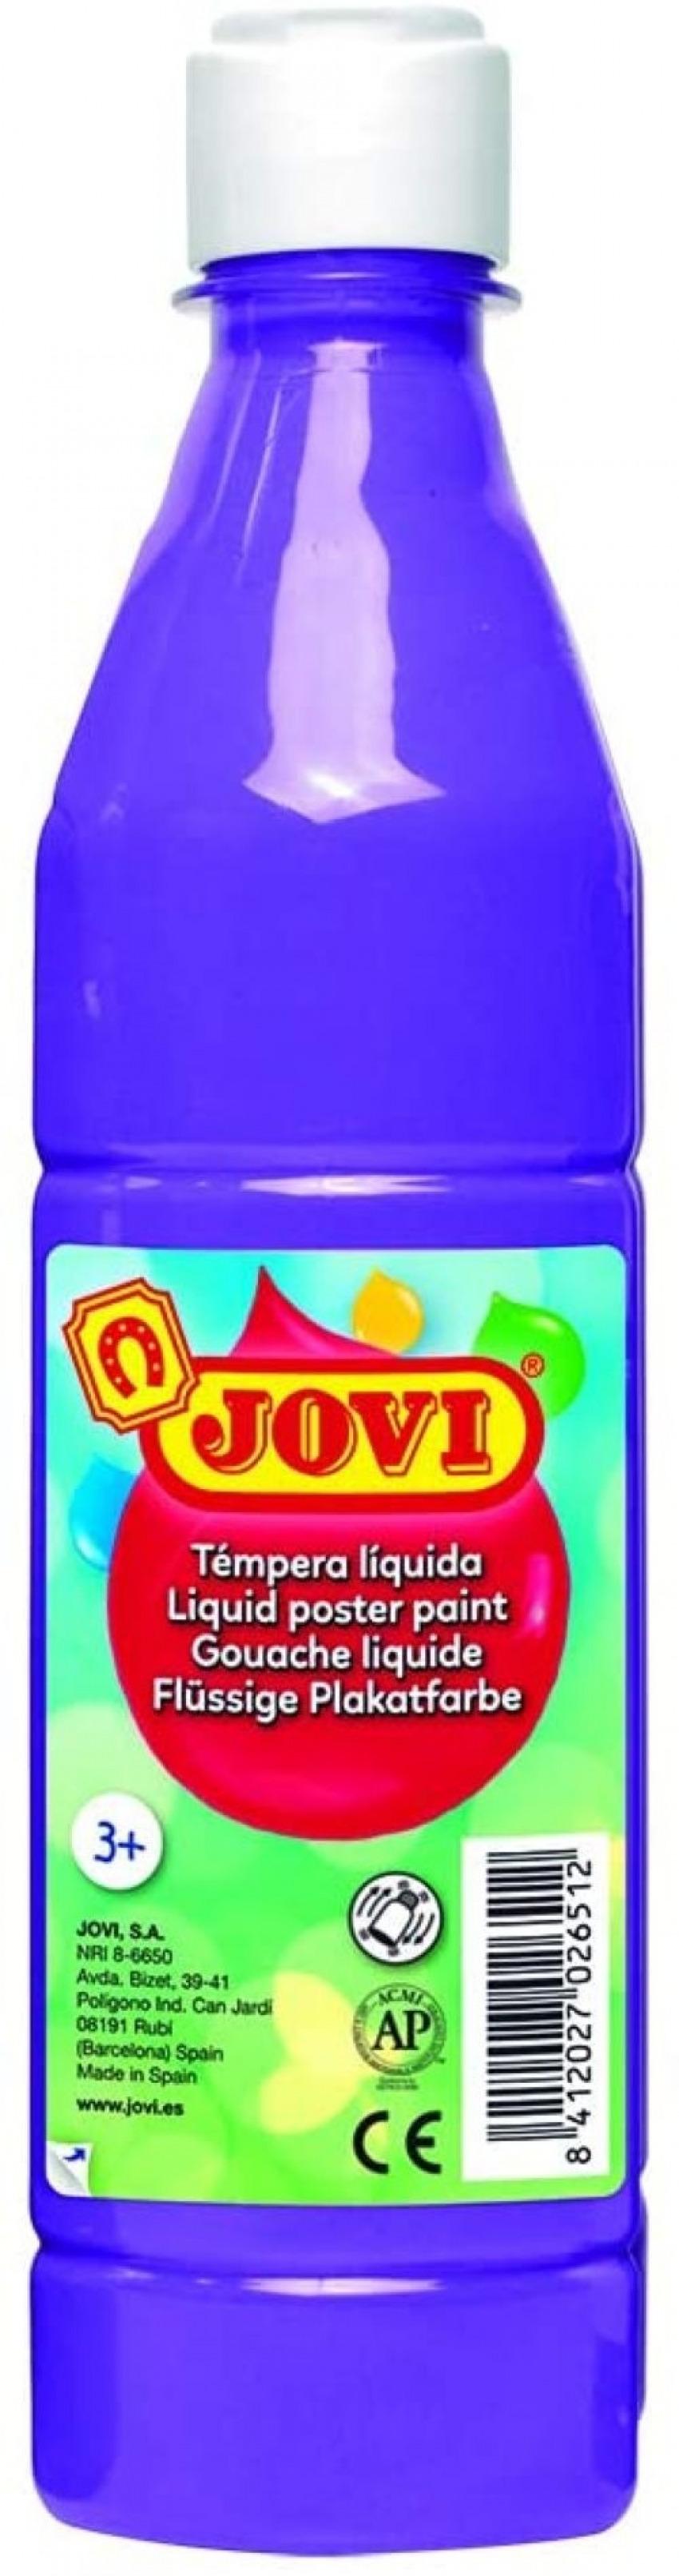 Bote tempera liquida jovi violeta 500 ml 8412027005630